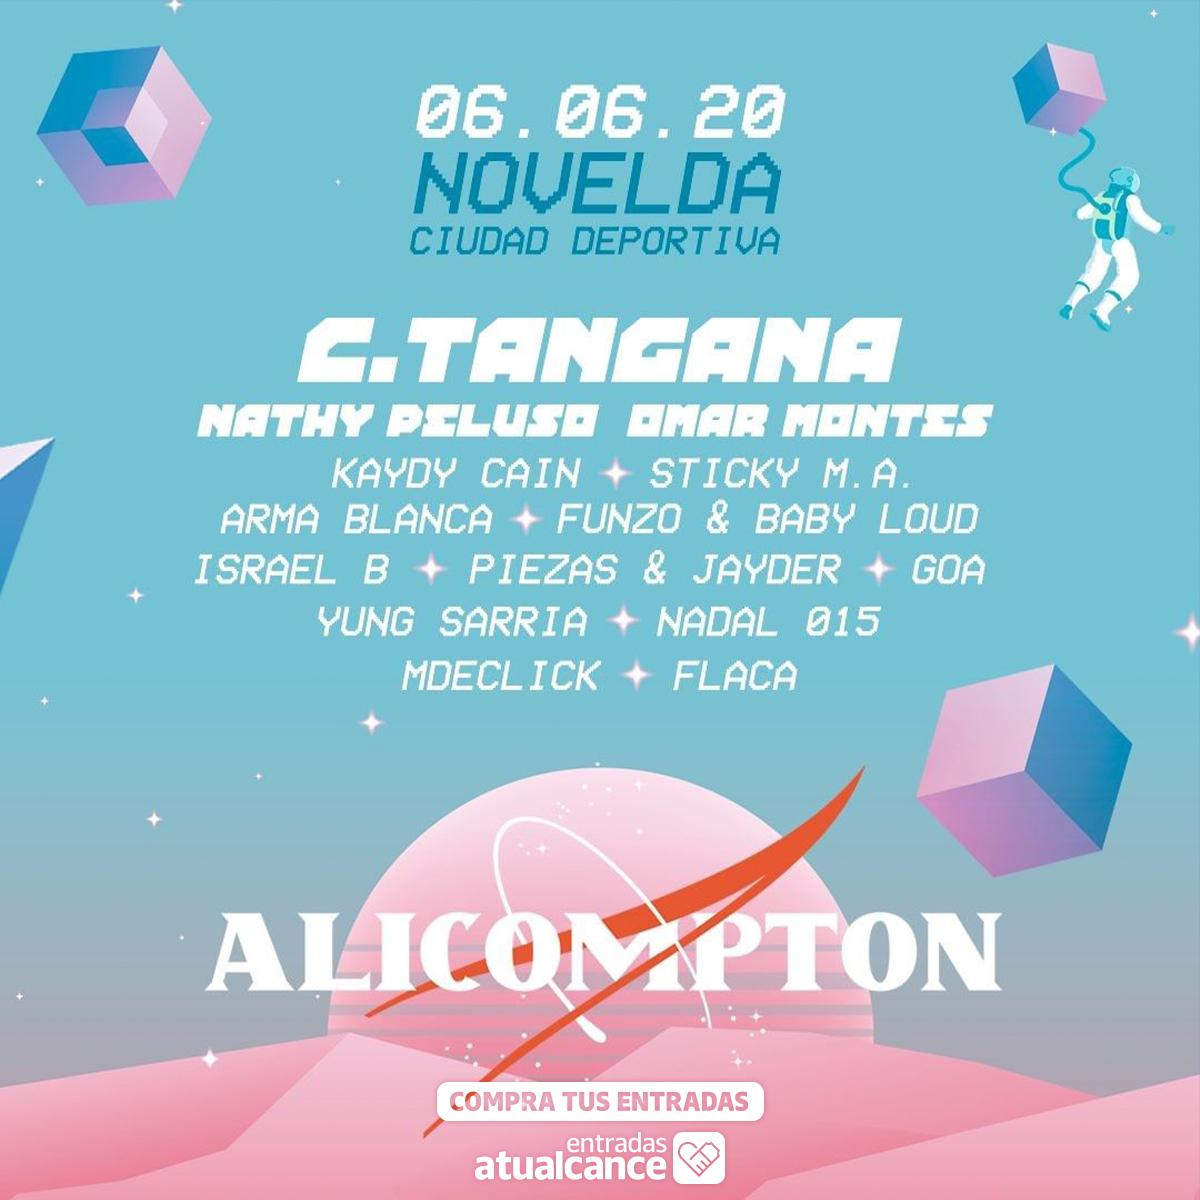 alicompton-festival-5e1602aa44217.jpeg